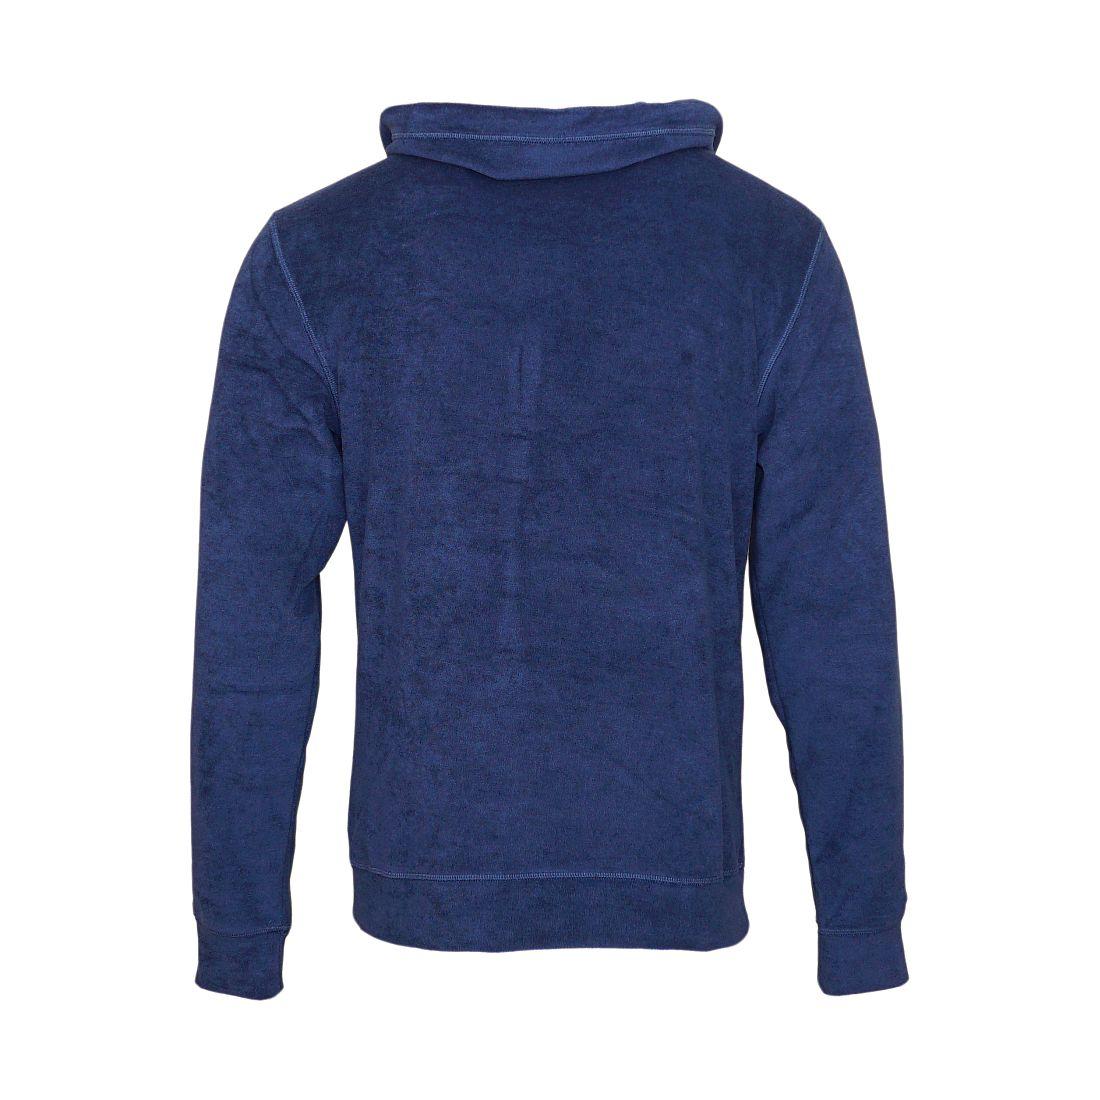 Emporio Armani Pullover Hoodie Sweater 111665 7P564 00134 BLU blau S17-EAN2